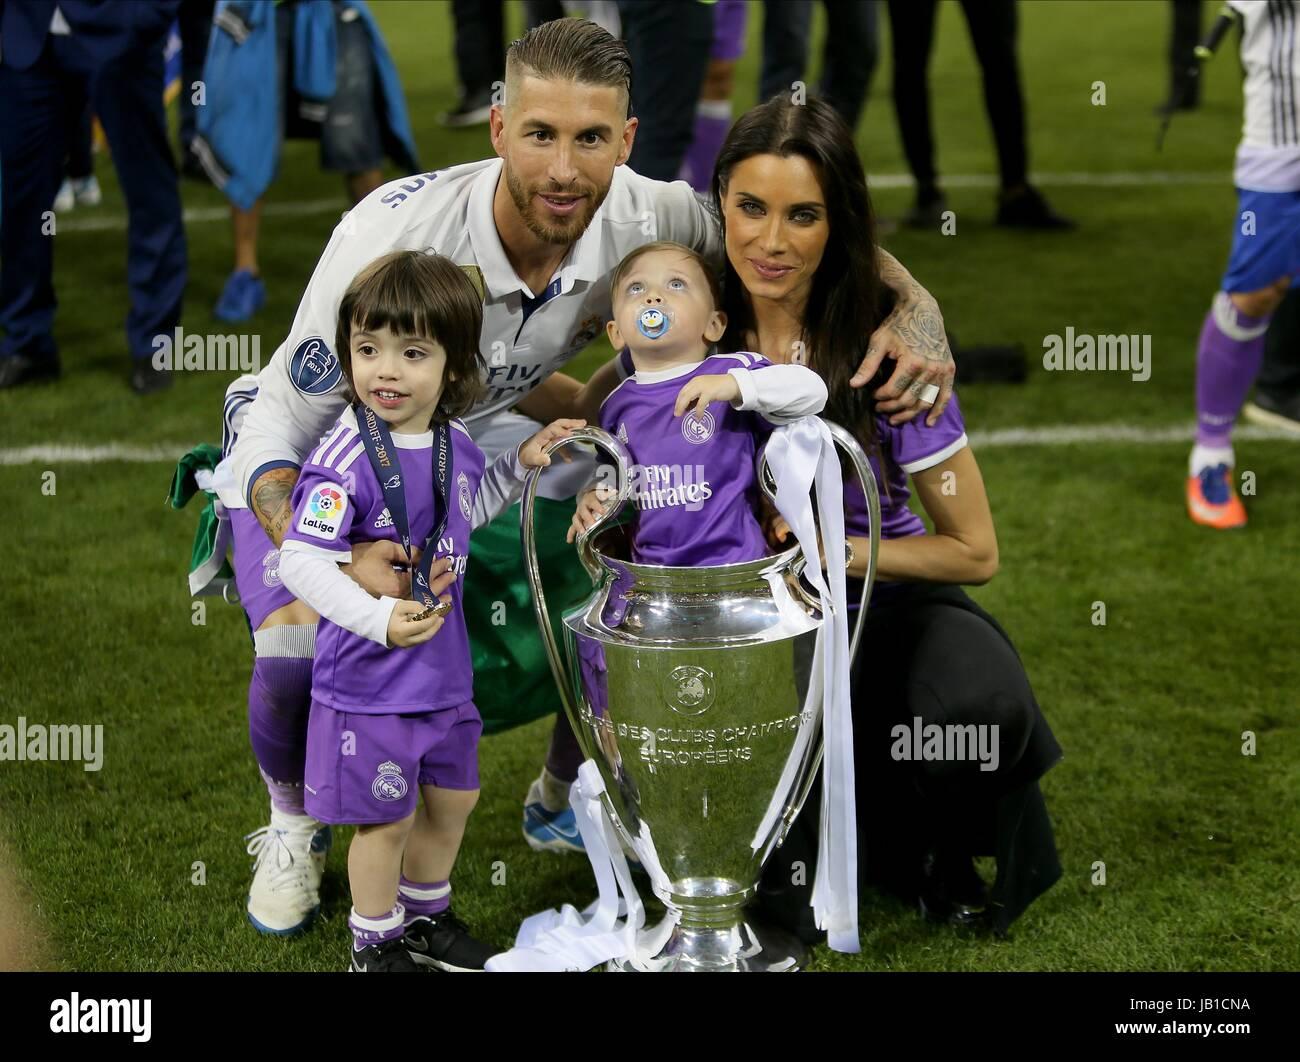 28b451ec4 SERGIO RAMOS AND FAMILY JUVENTUS V REAL MADRID NATIONAL STADIUM CARDIFF  WALES 03 June 2017